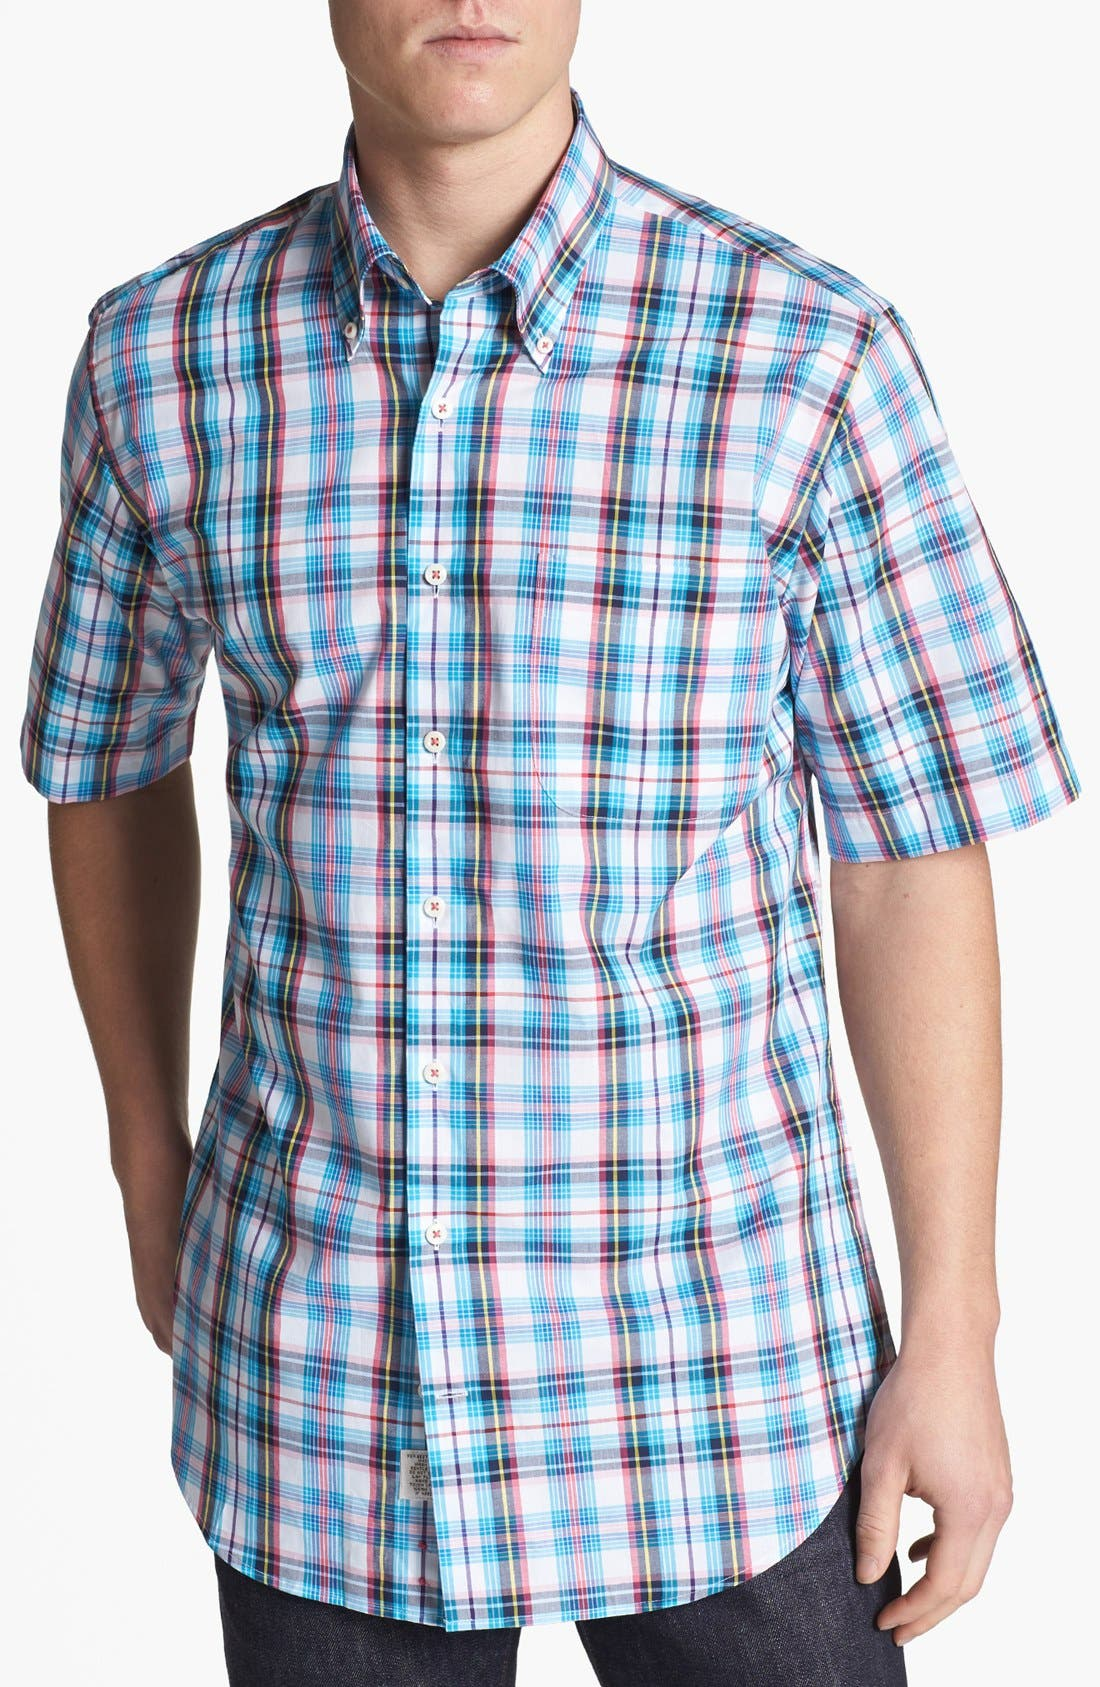 Alternate Image 1 Selected - Peter Millar 'Nantucket' Tartan Short Sleeve Sport Shirt